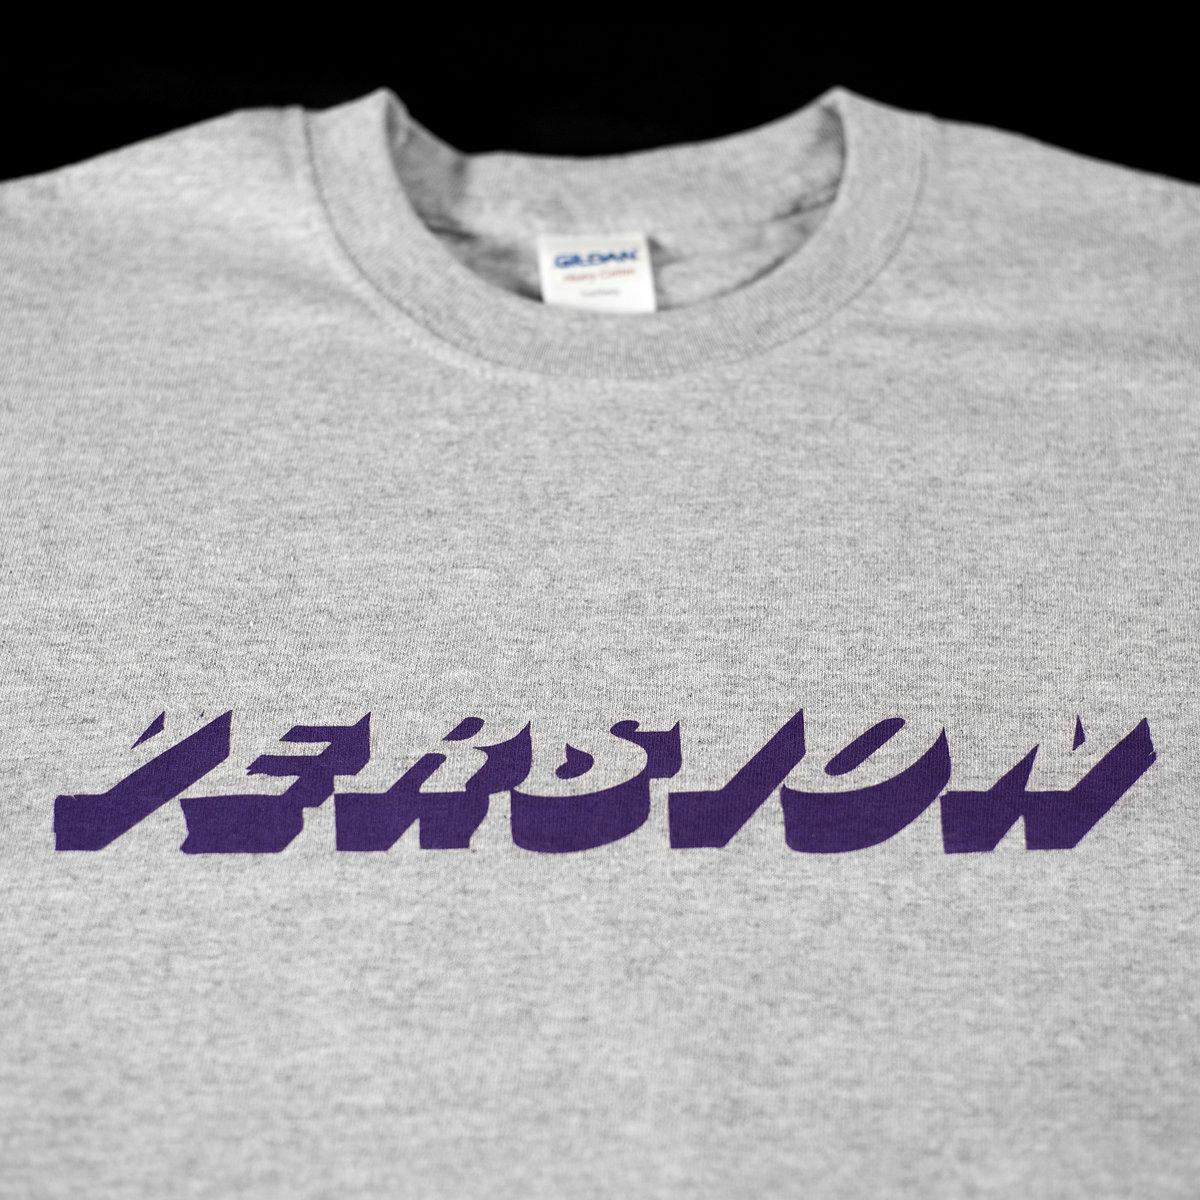 ... VERSION t-shirt 001 (purple/grey) photo